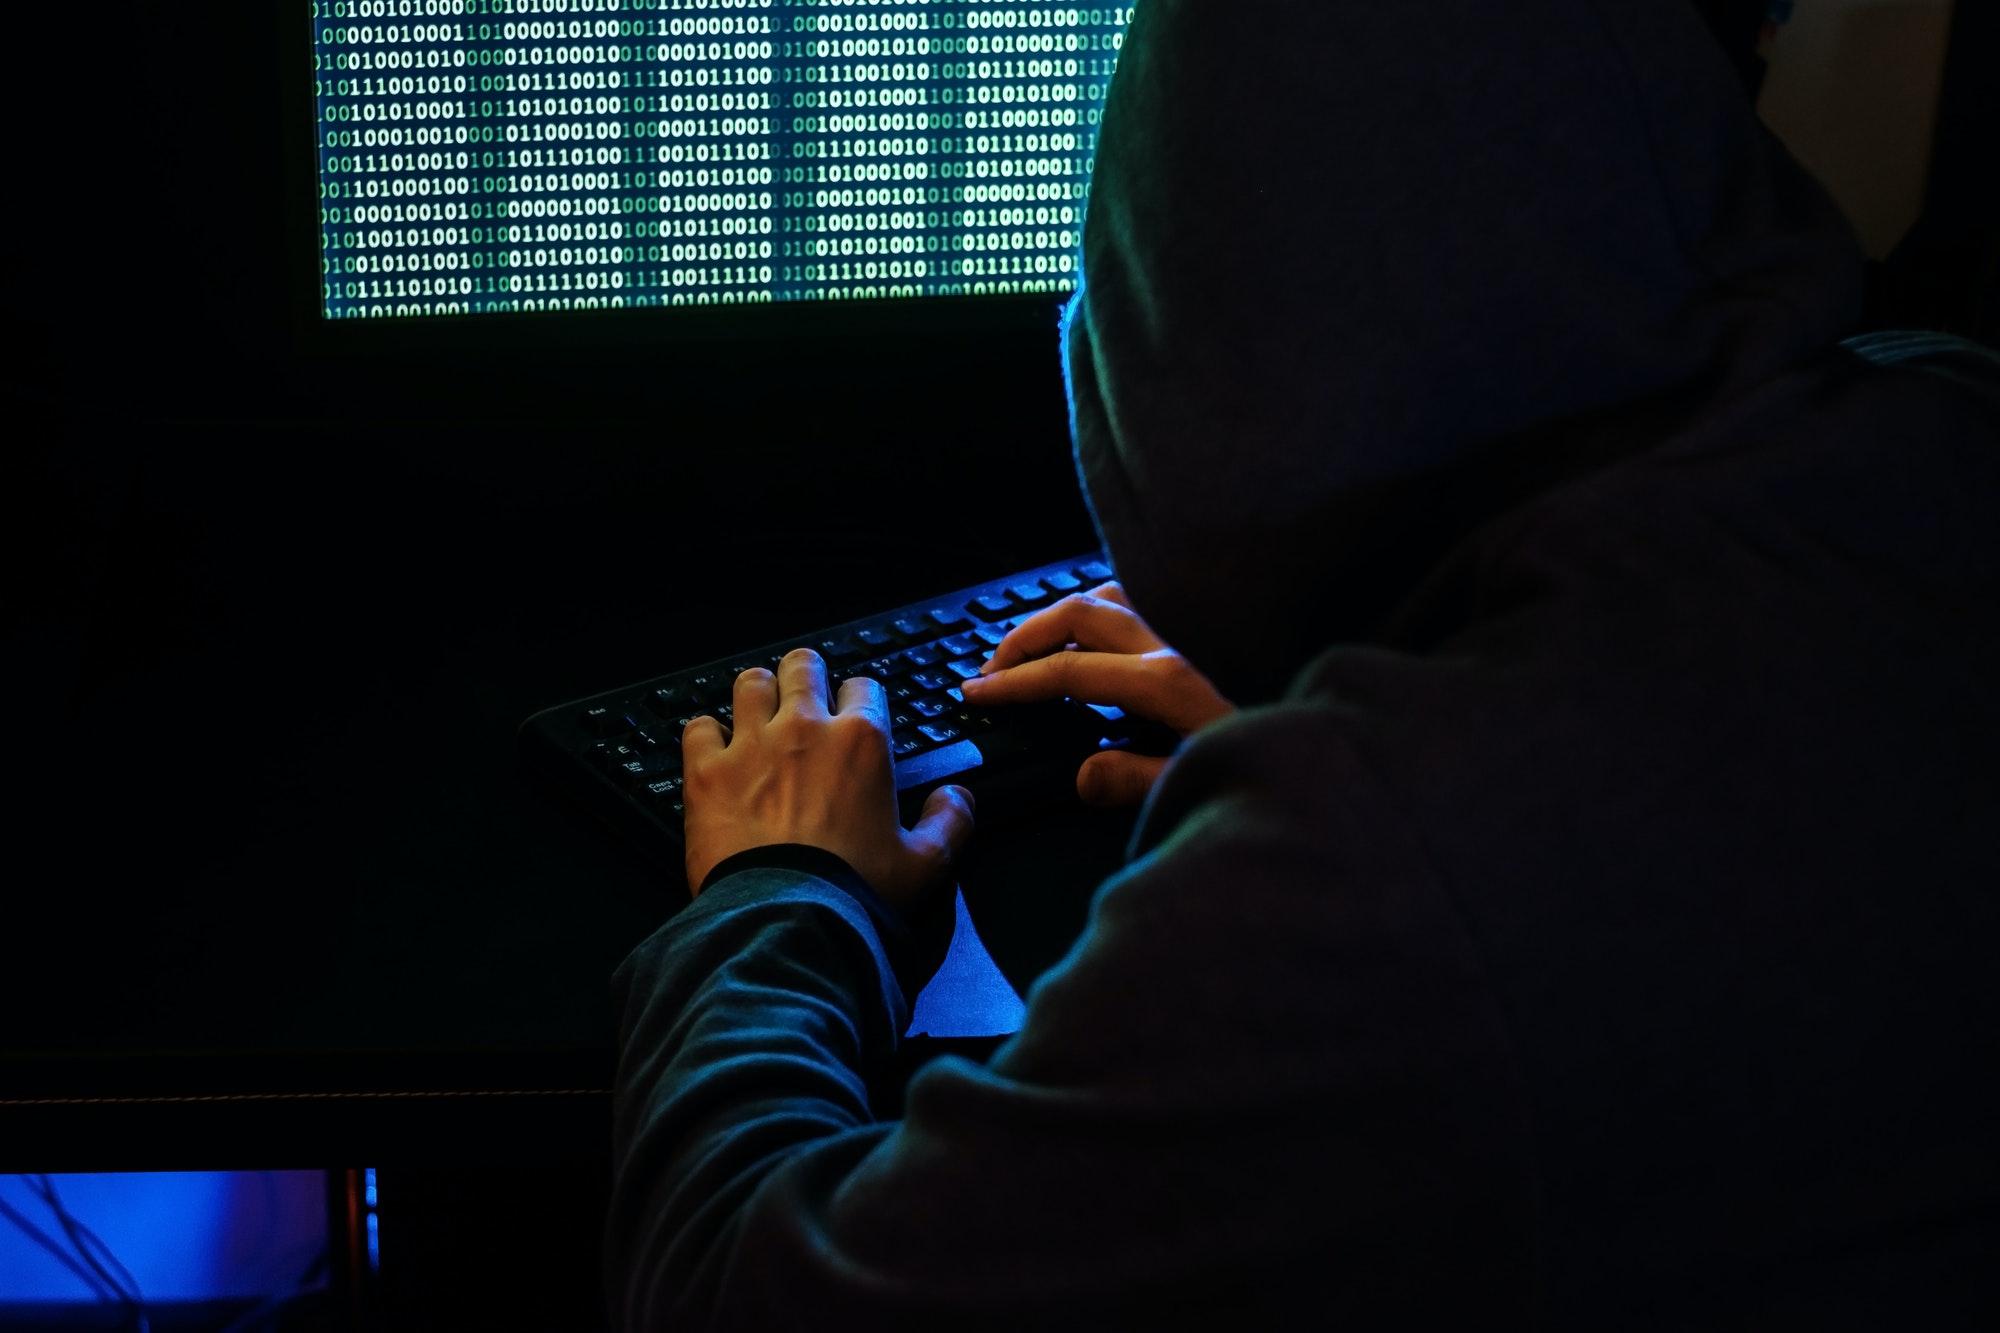 Cybercrime through the Internet.